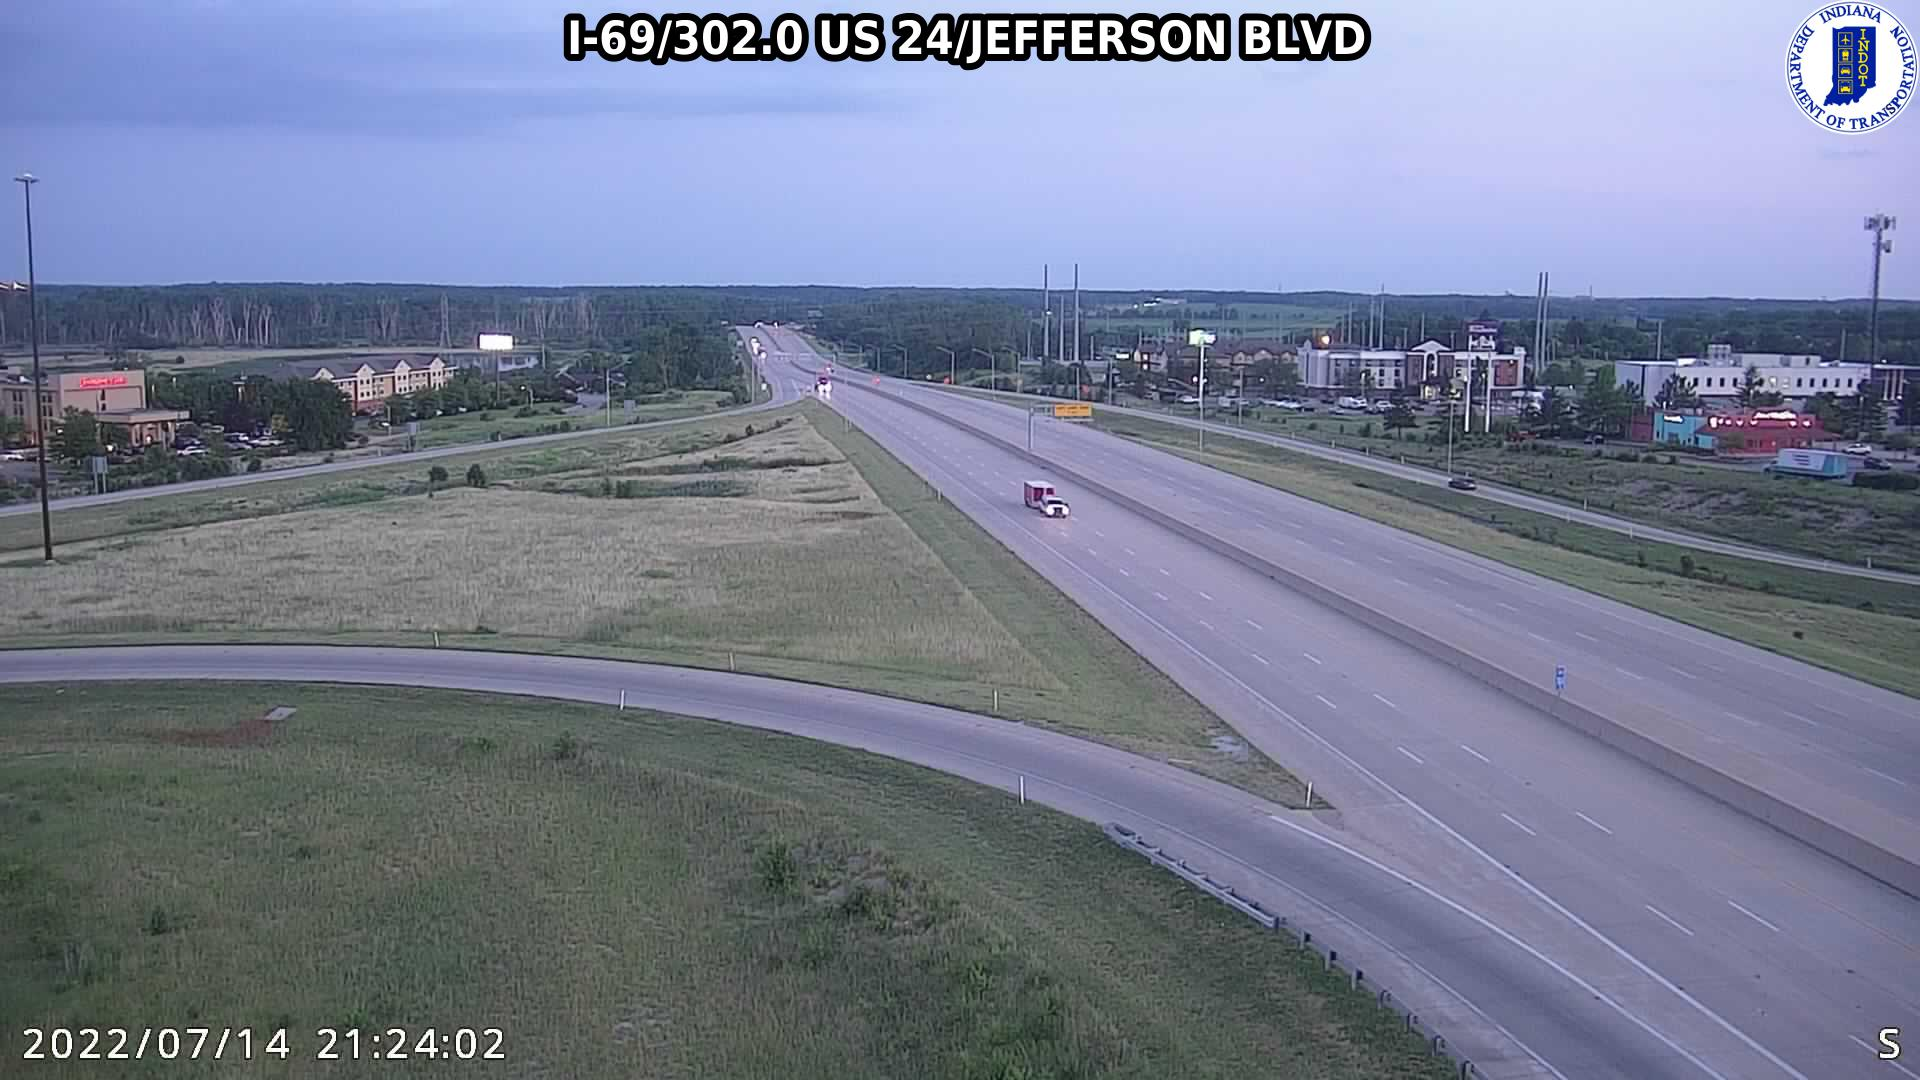 I-69 JEFFERSON/US 24 CAM